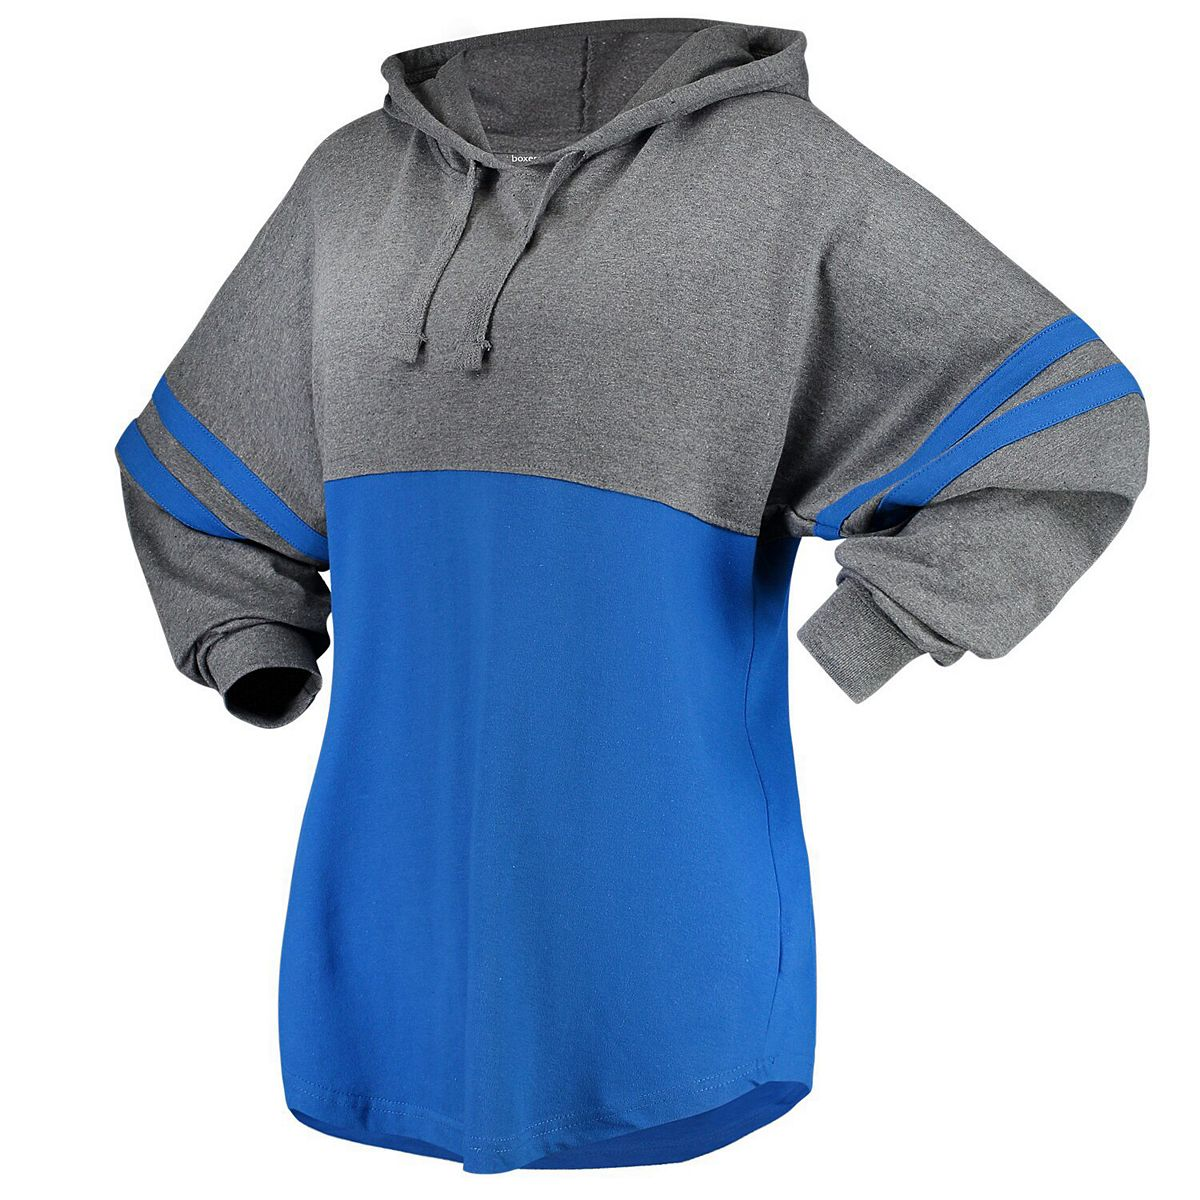 Women's Royal/Charcoal Seton Hall Pirates Pom Pom Jersey Oversized Long Sleeve Hoodie T-Shirt xgRbA